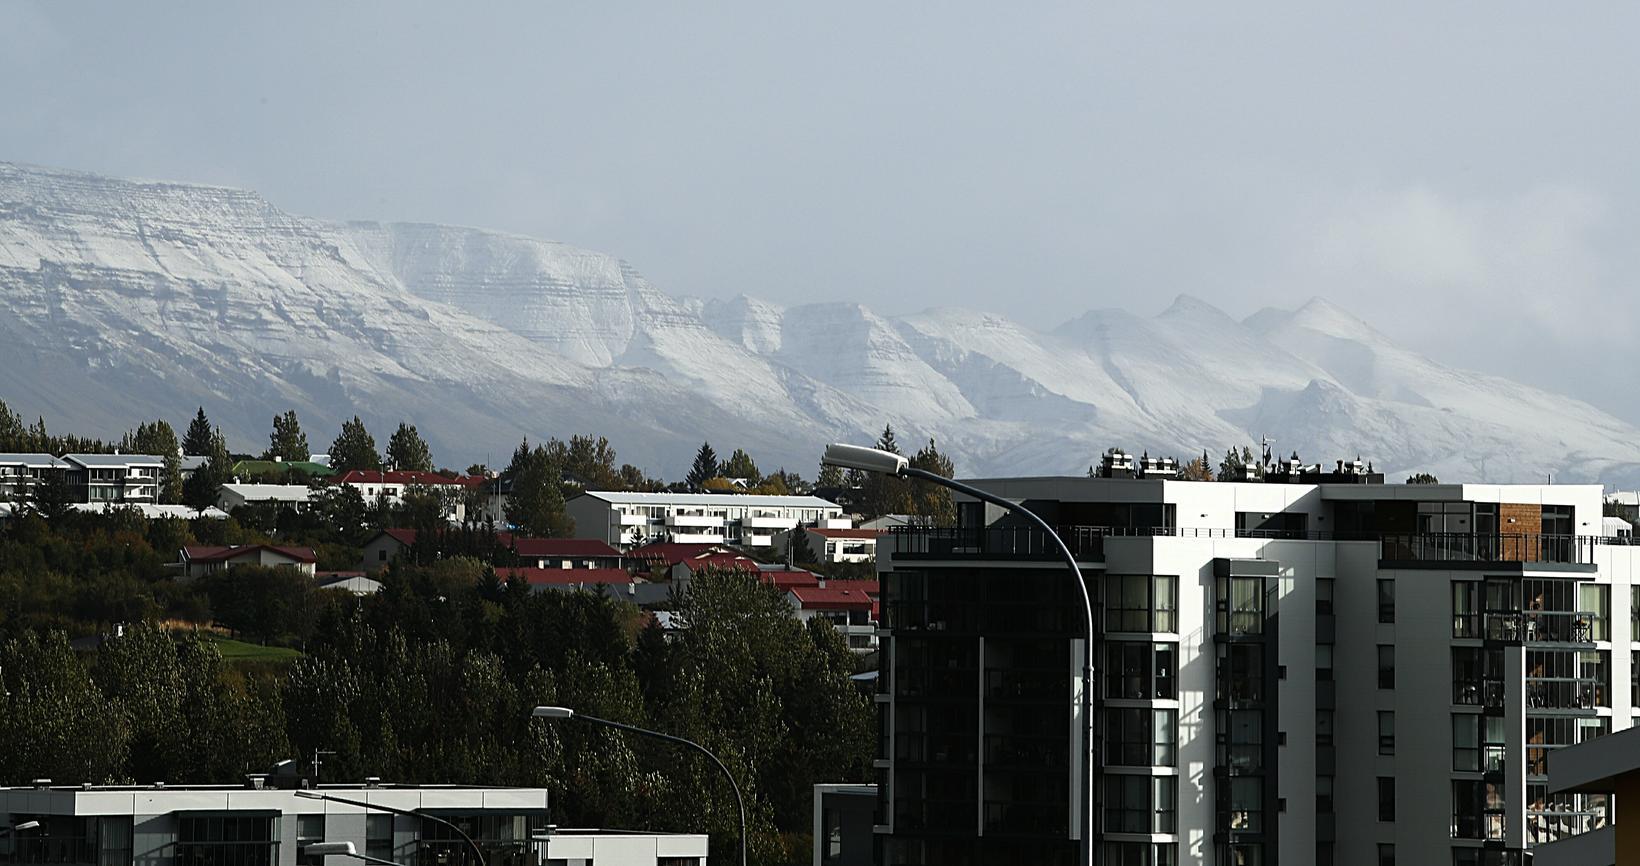 Esja mountain, seen from Reykjavík, this morning.